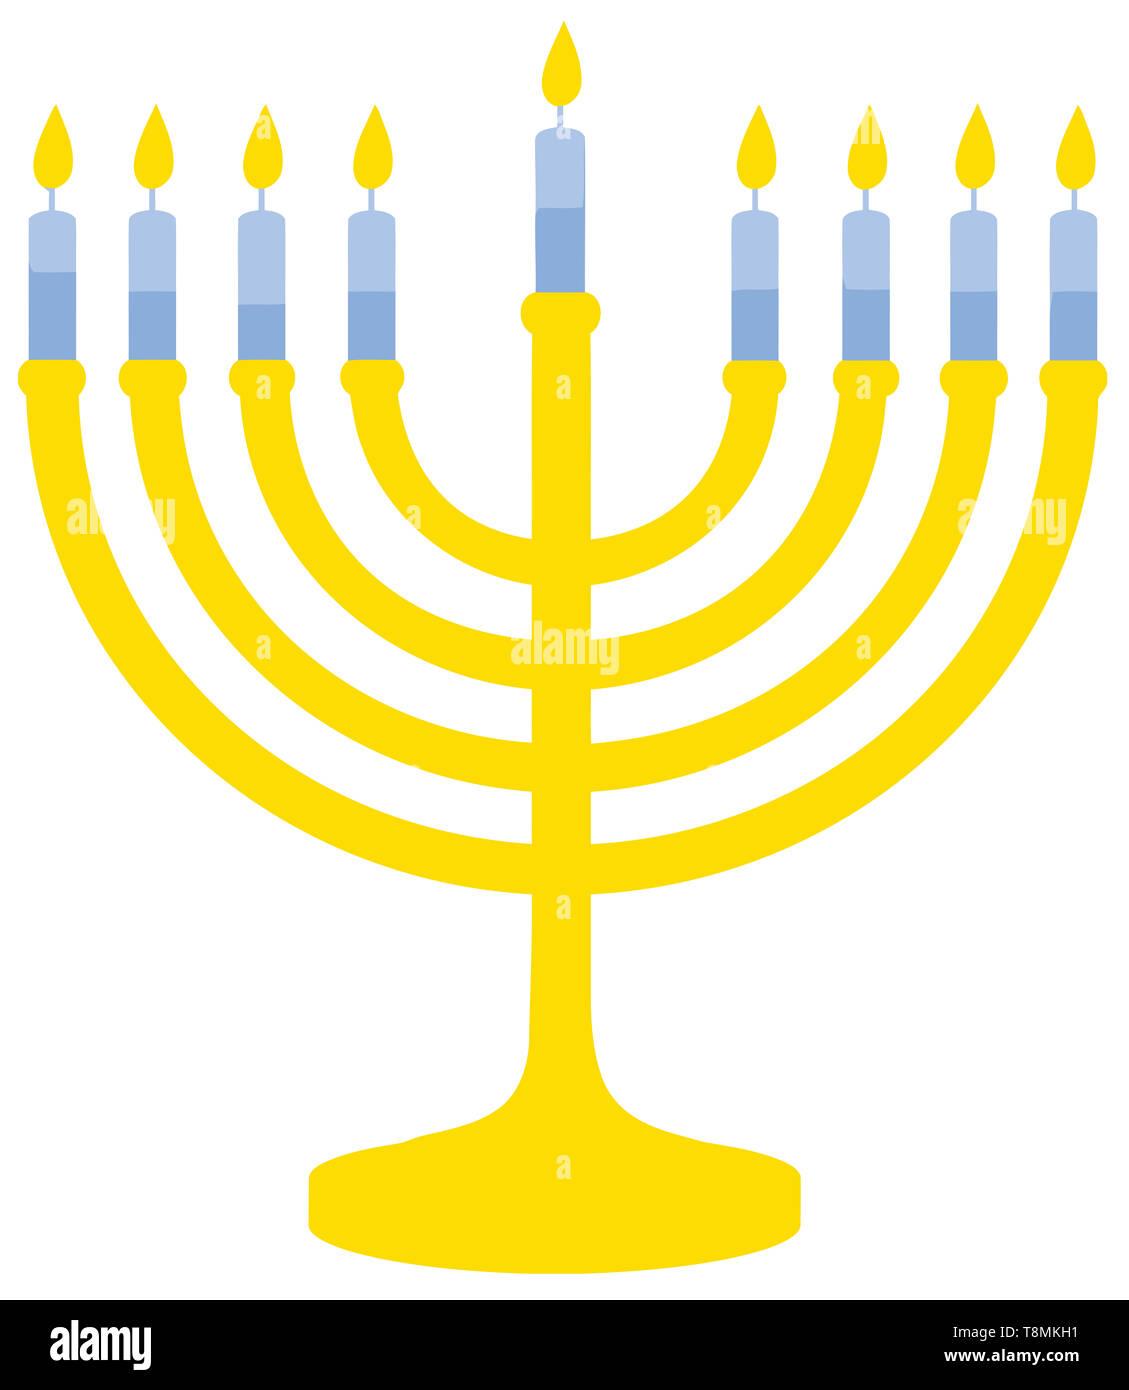 hanukkah menorah culture jewish celebration candle illustration faith israel - Stock Image